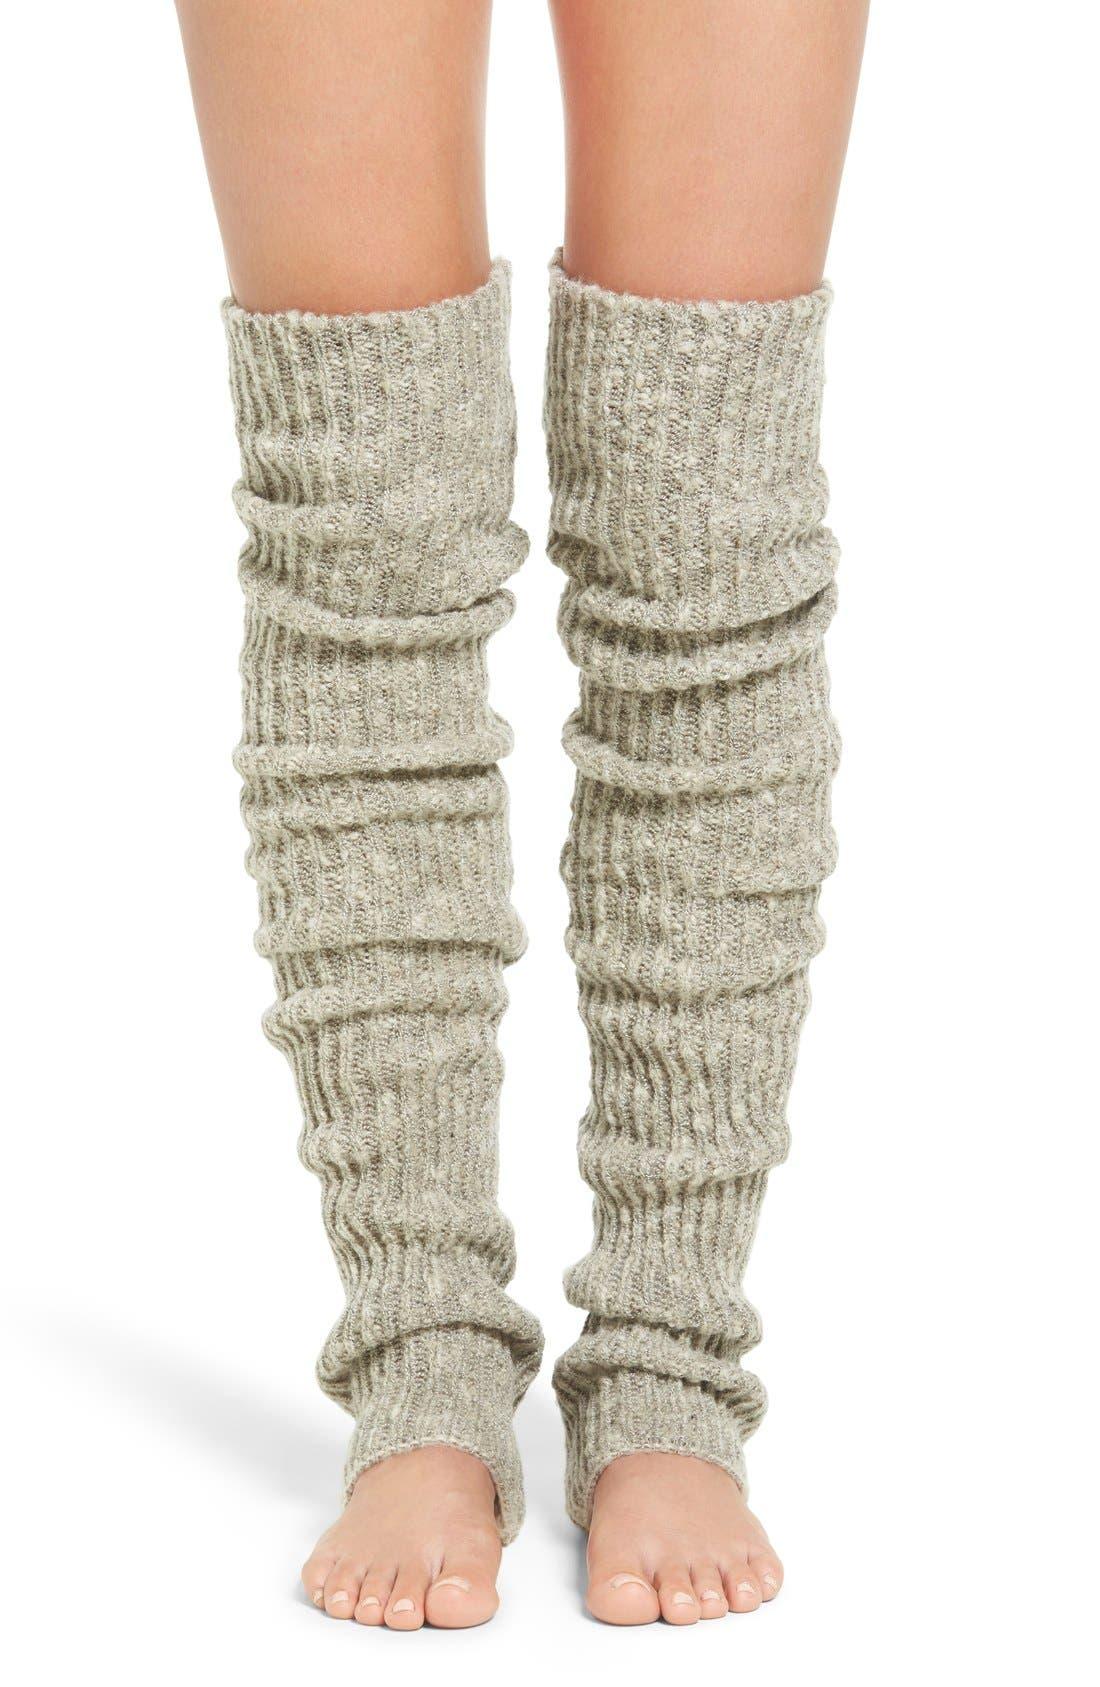 Main Image - Lemon 'Flurry' Rib Knit Leg Warmers